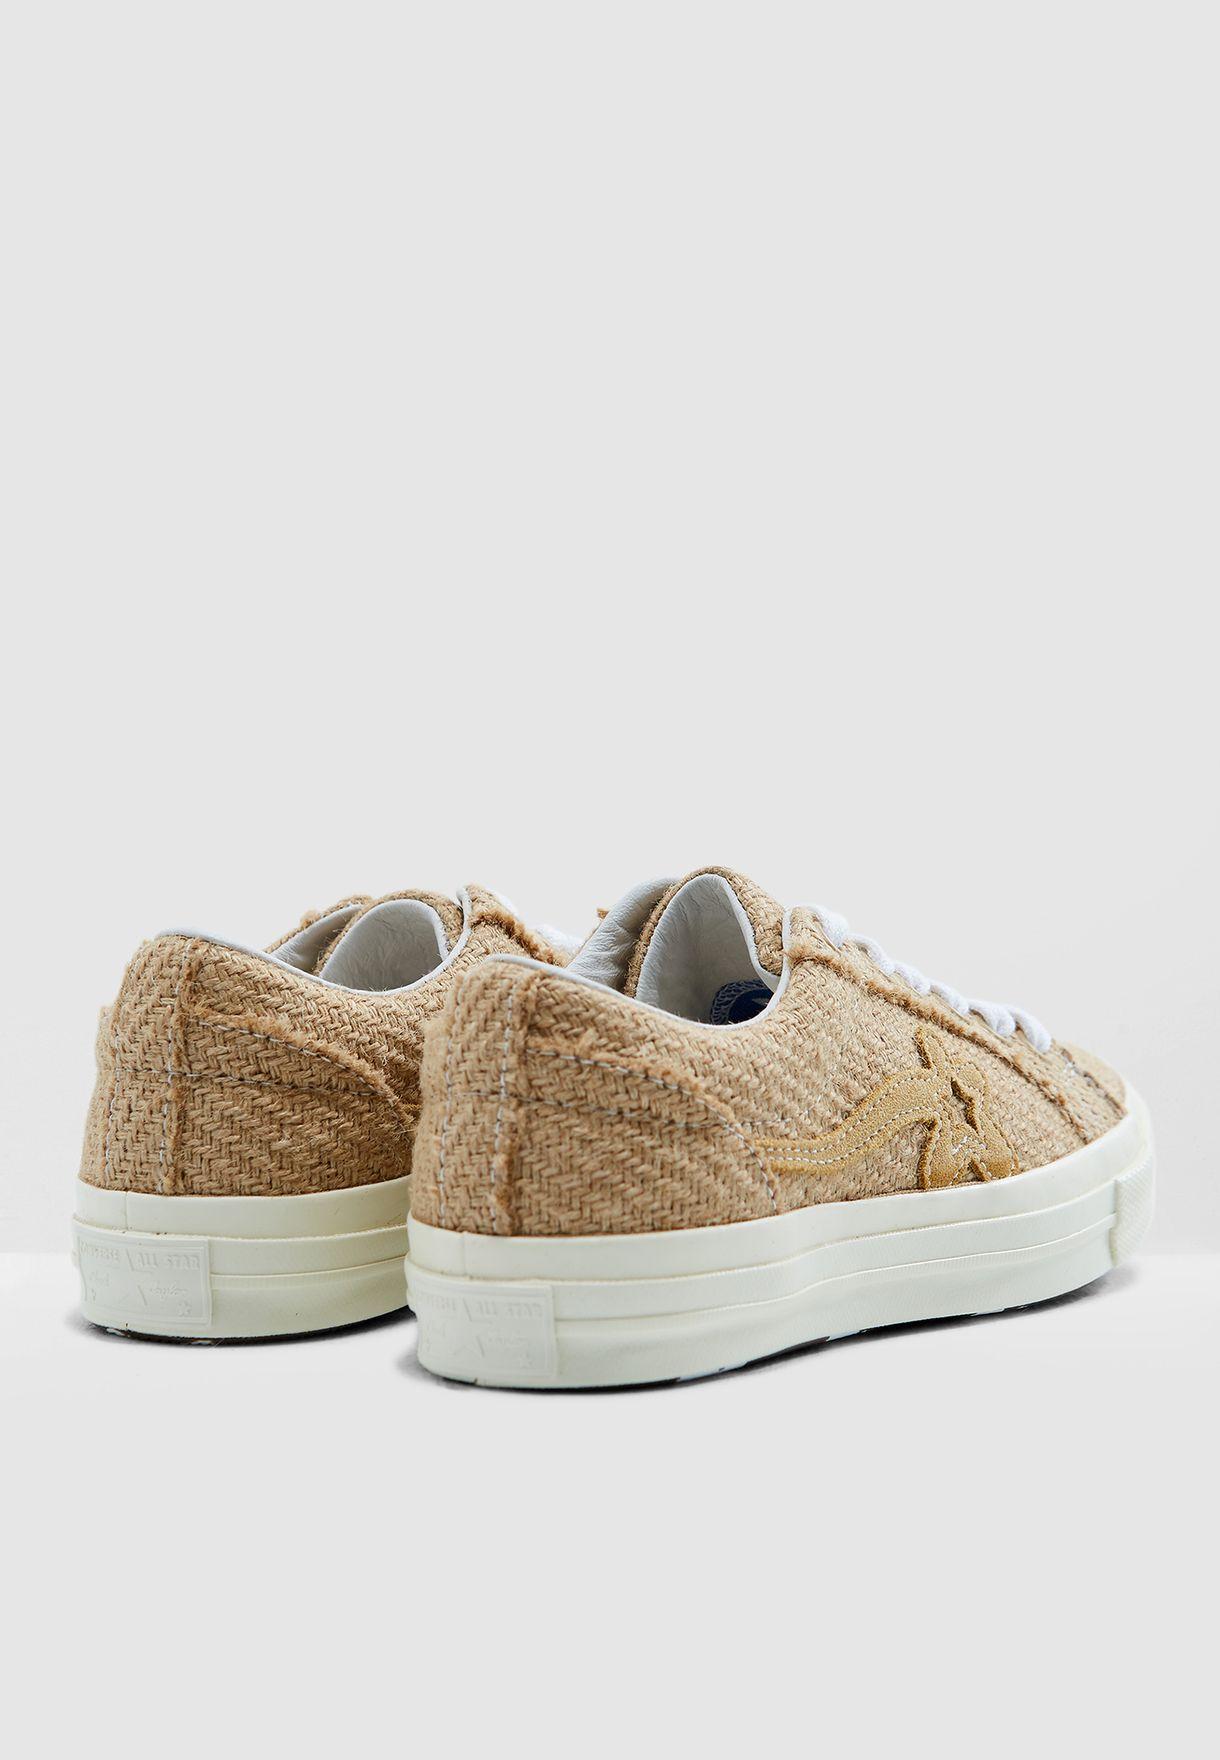 حذاء جولف لي فلير اوكس